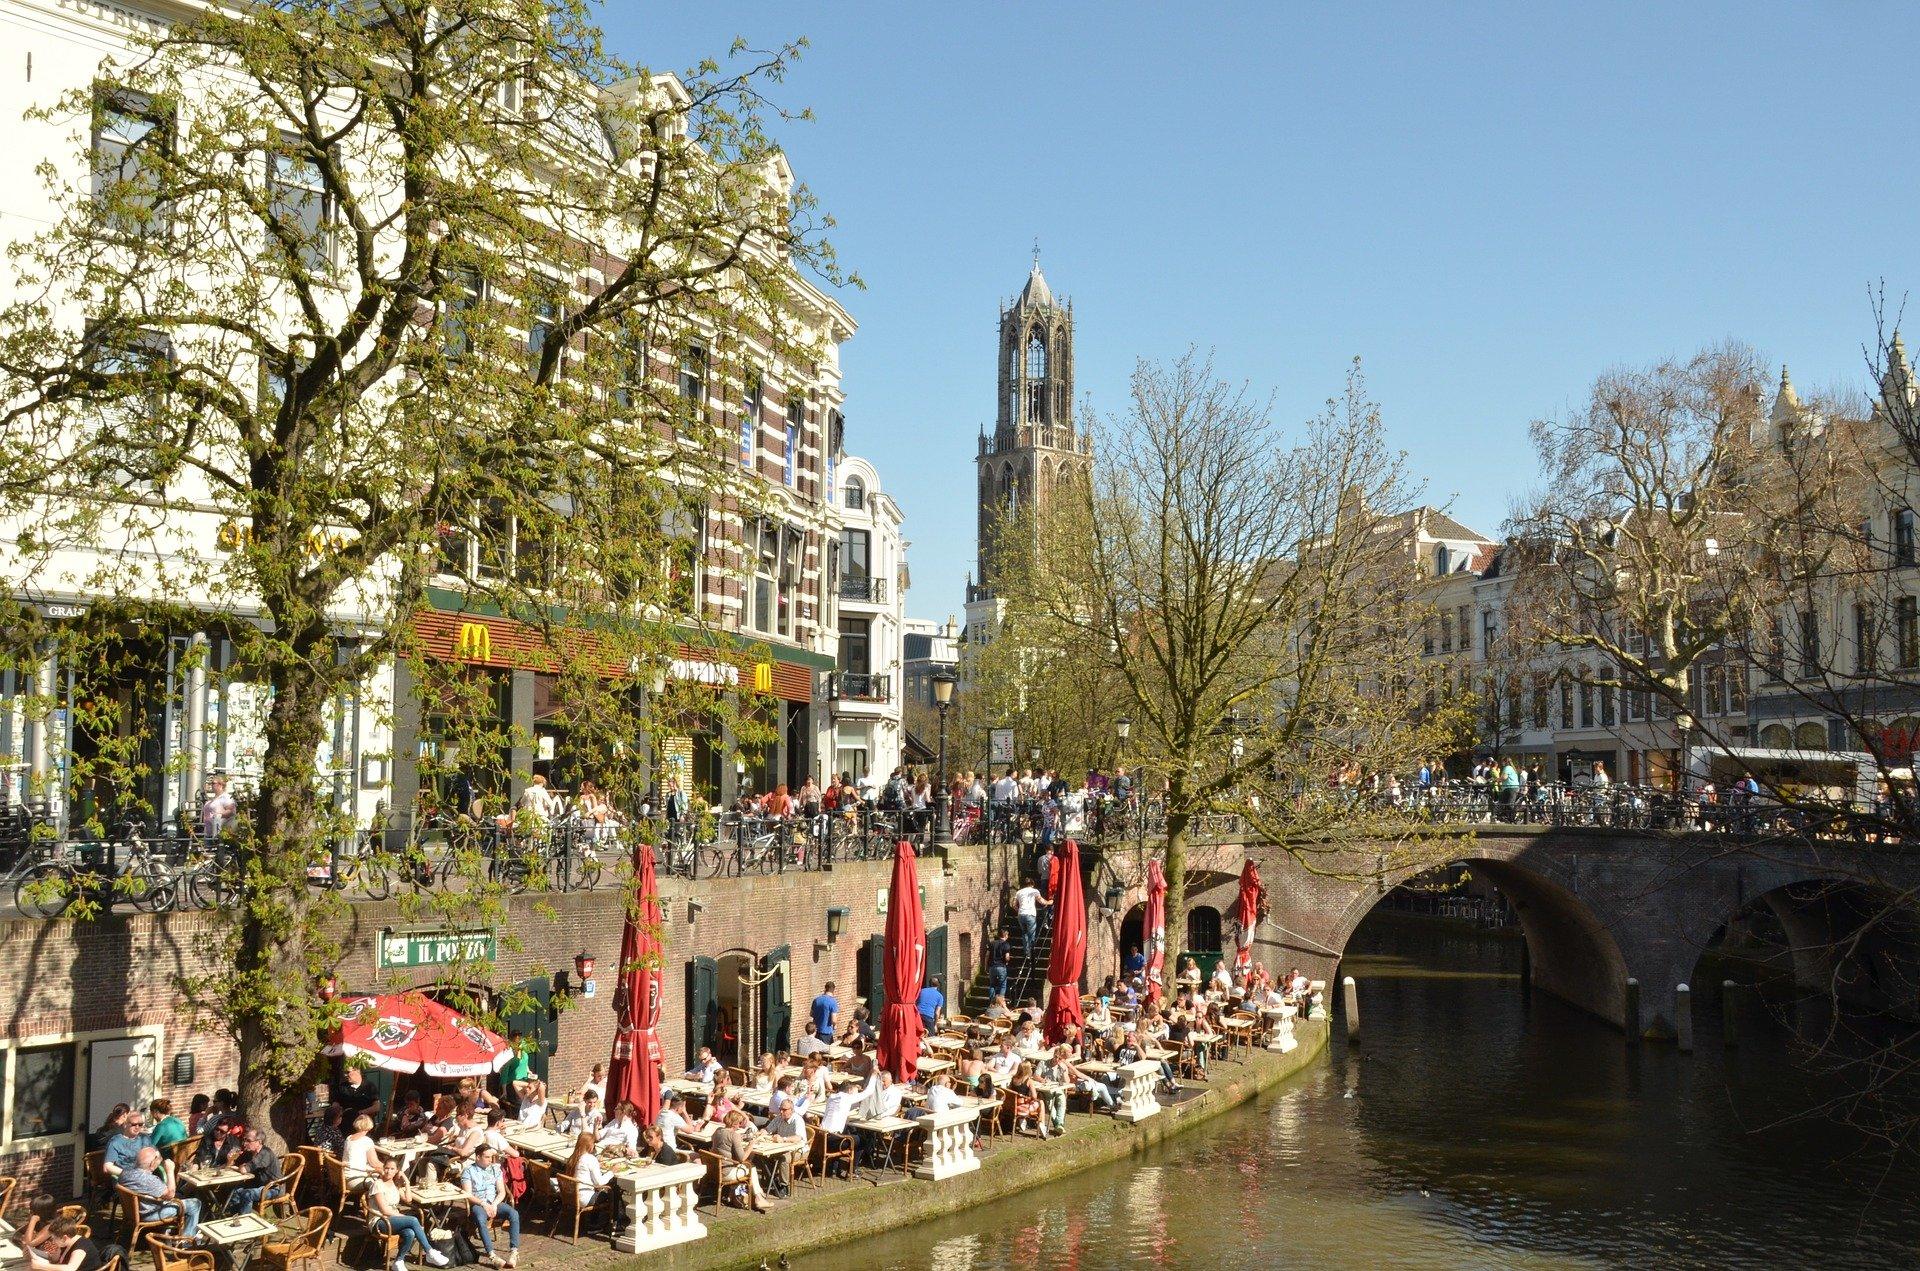 netherlands-1424996_1920 (1)